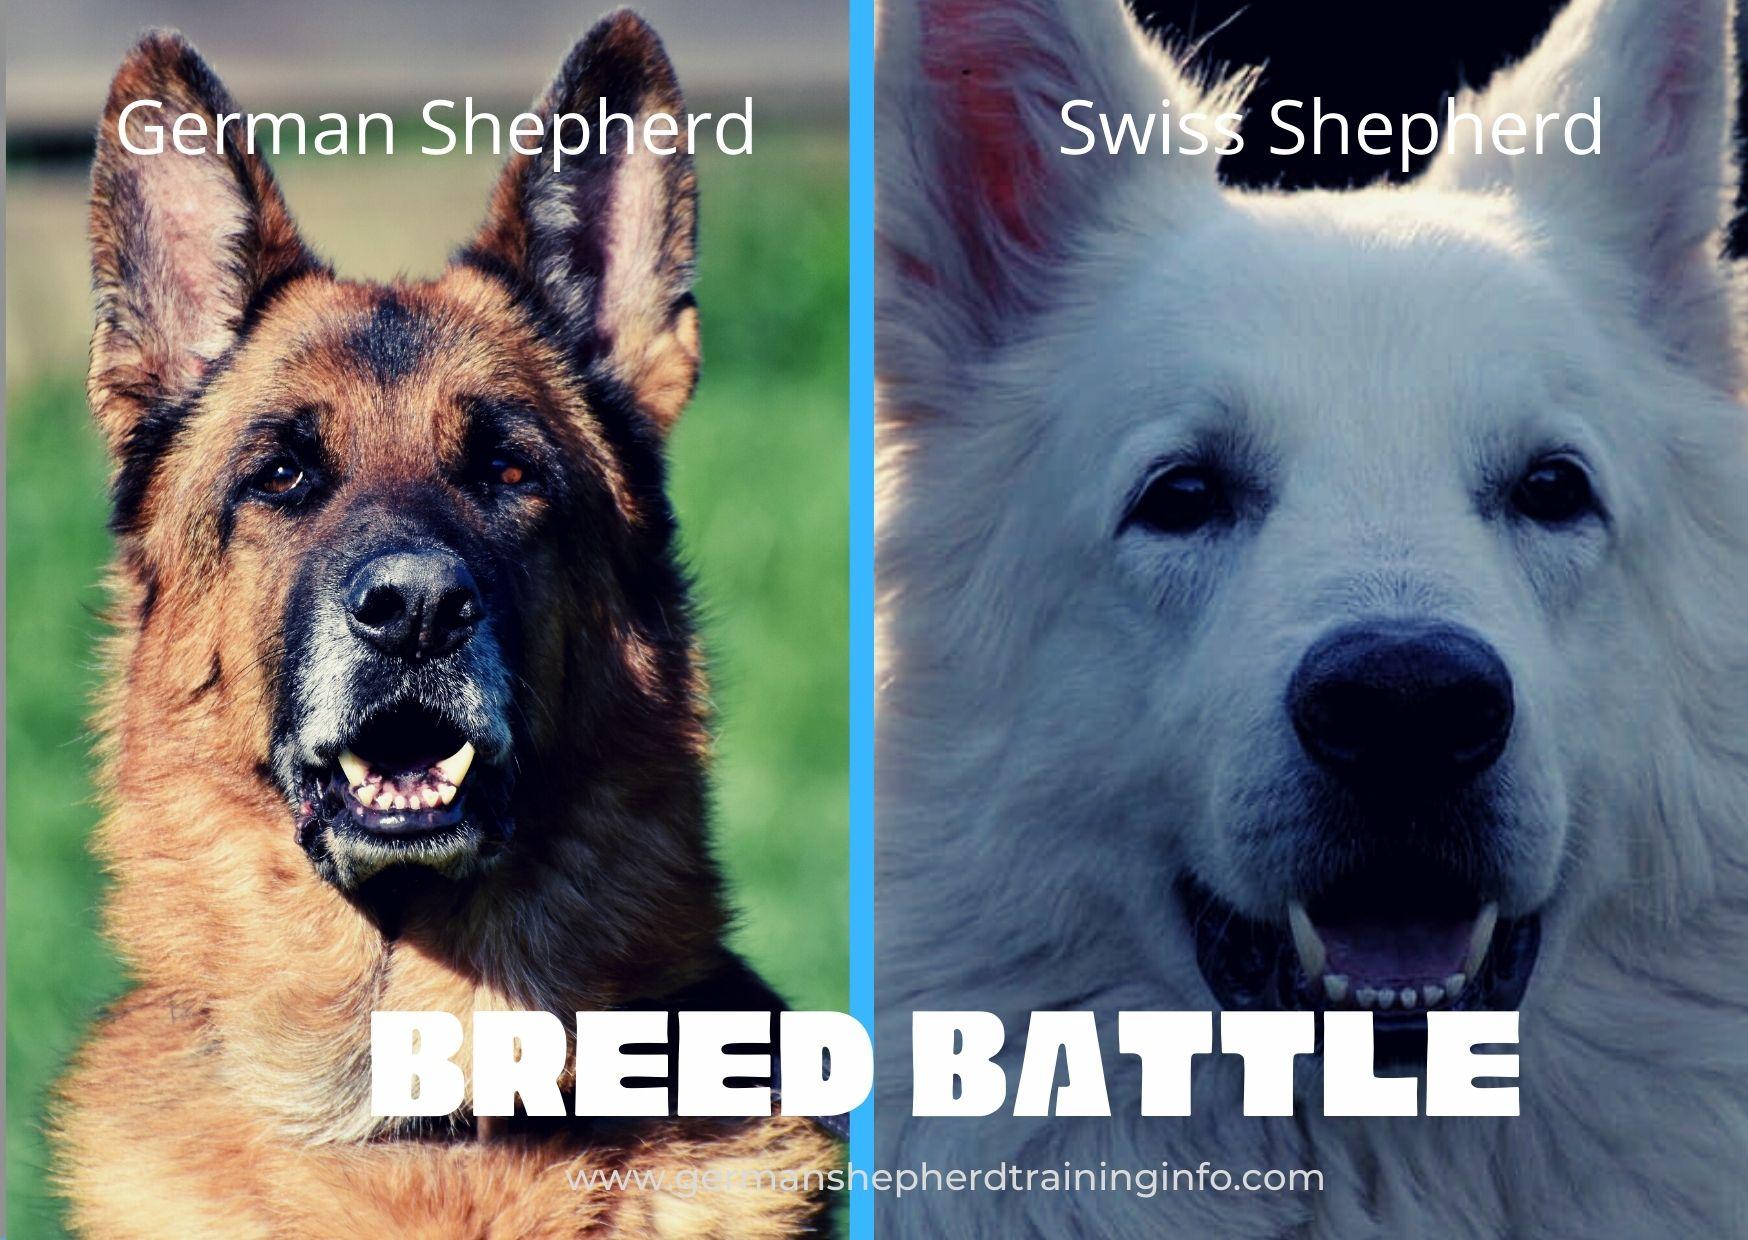 German Shepherd vs Swiss Shepherd: size, color, coat, temperament, comparison guide